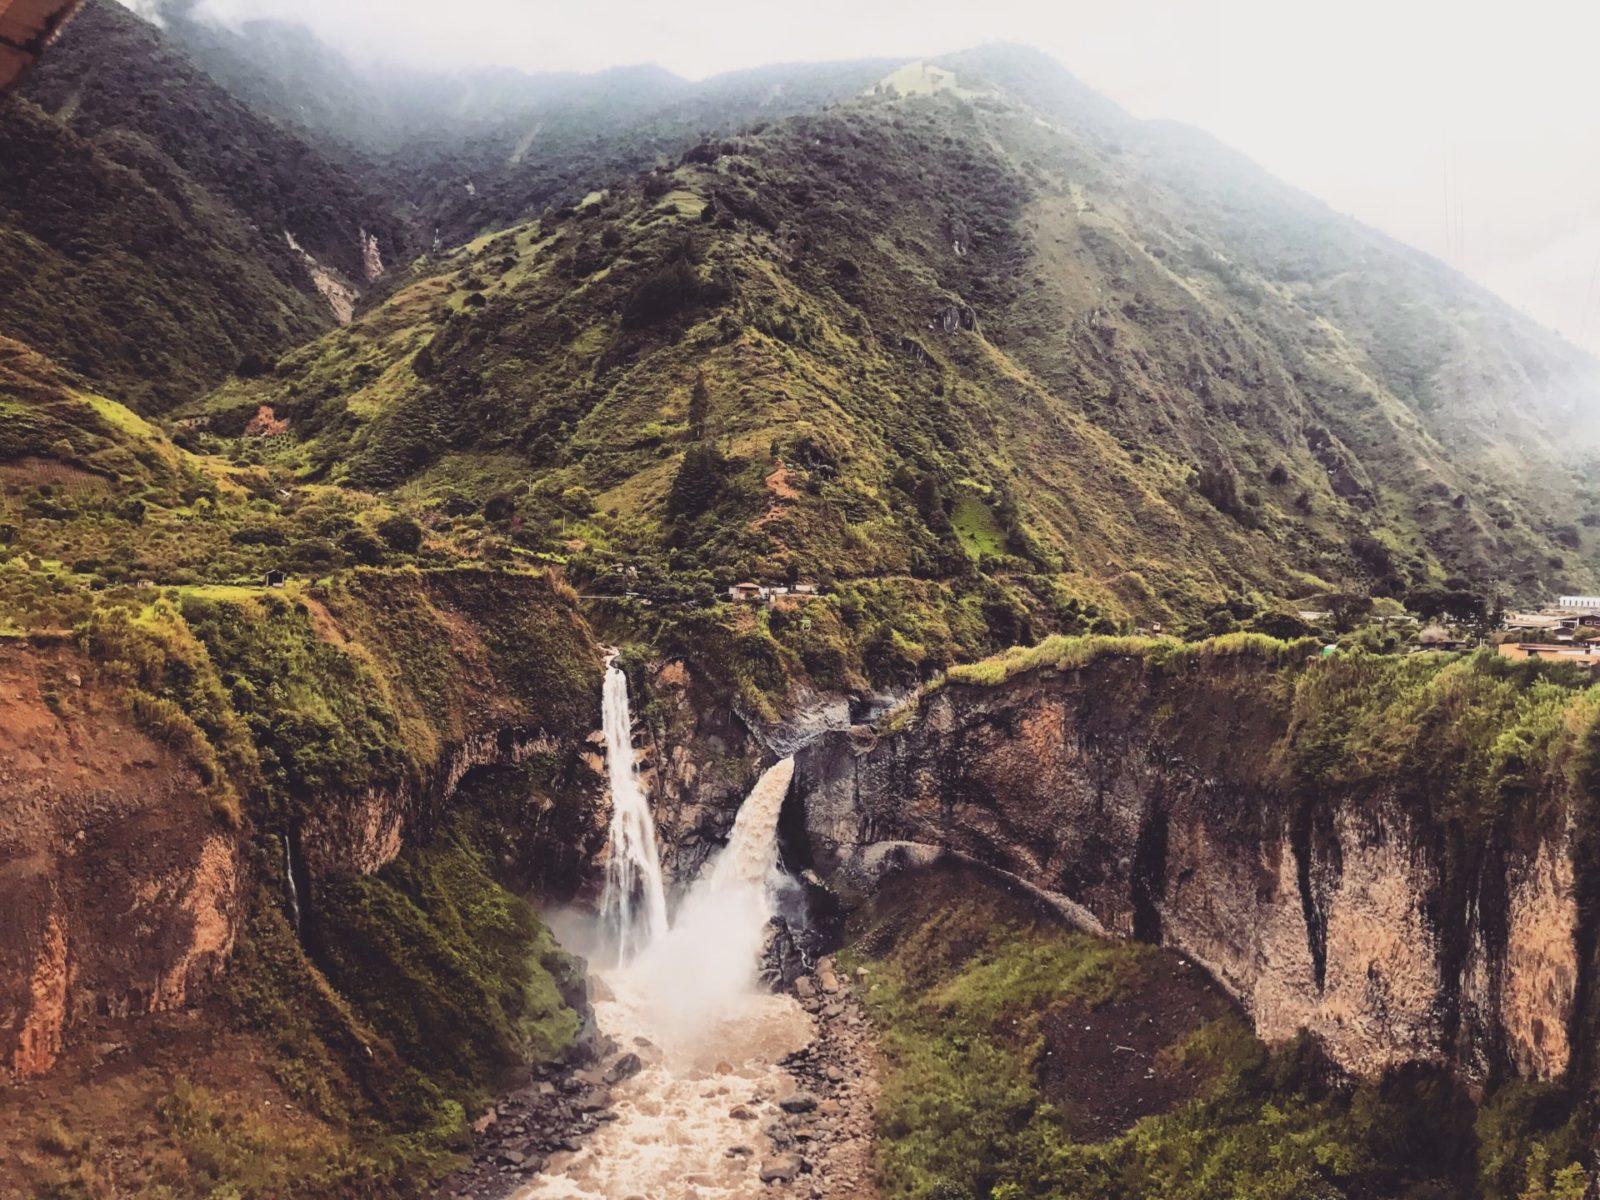 wodospady i wulkany w Banos